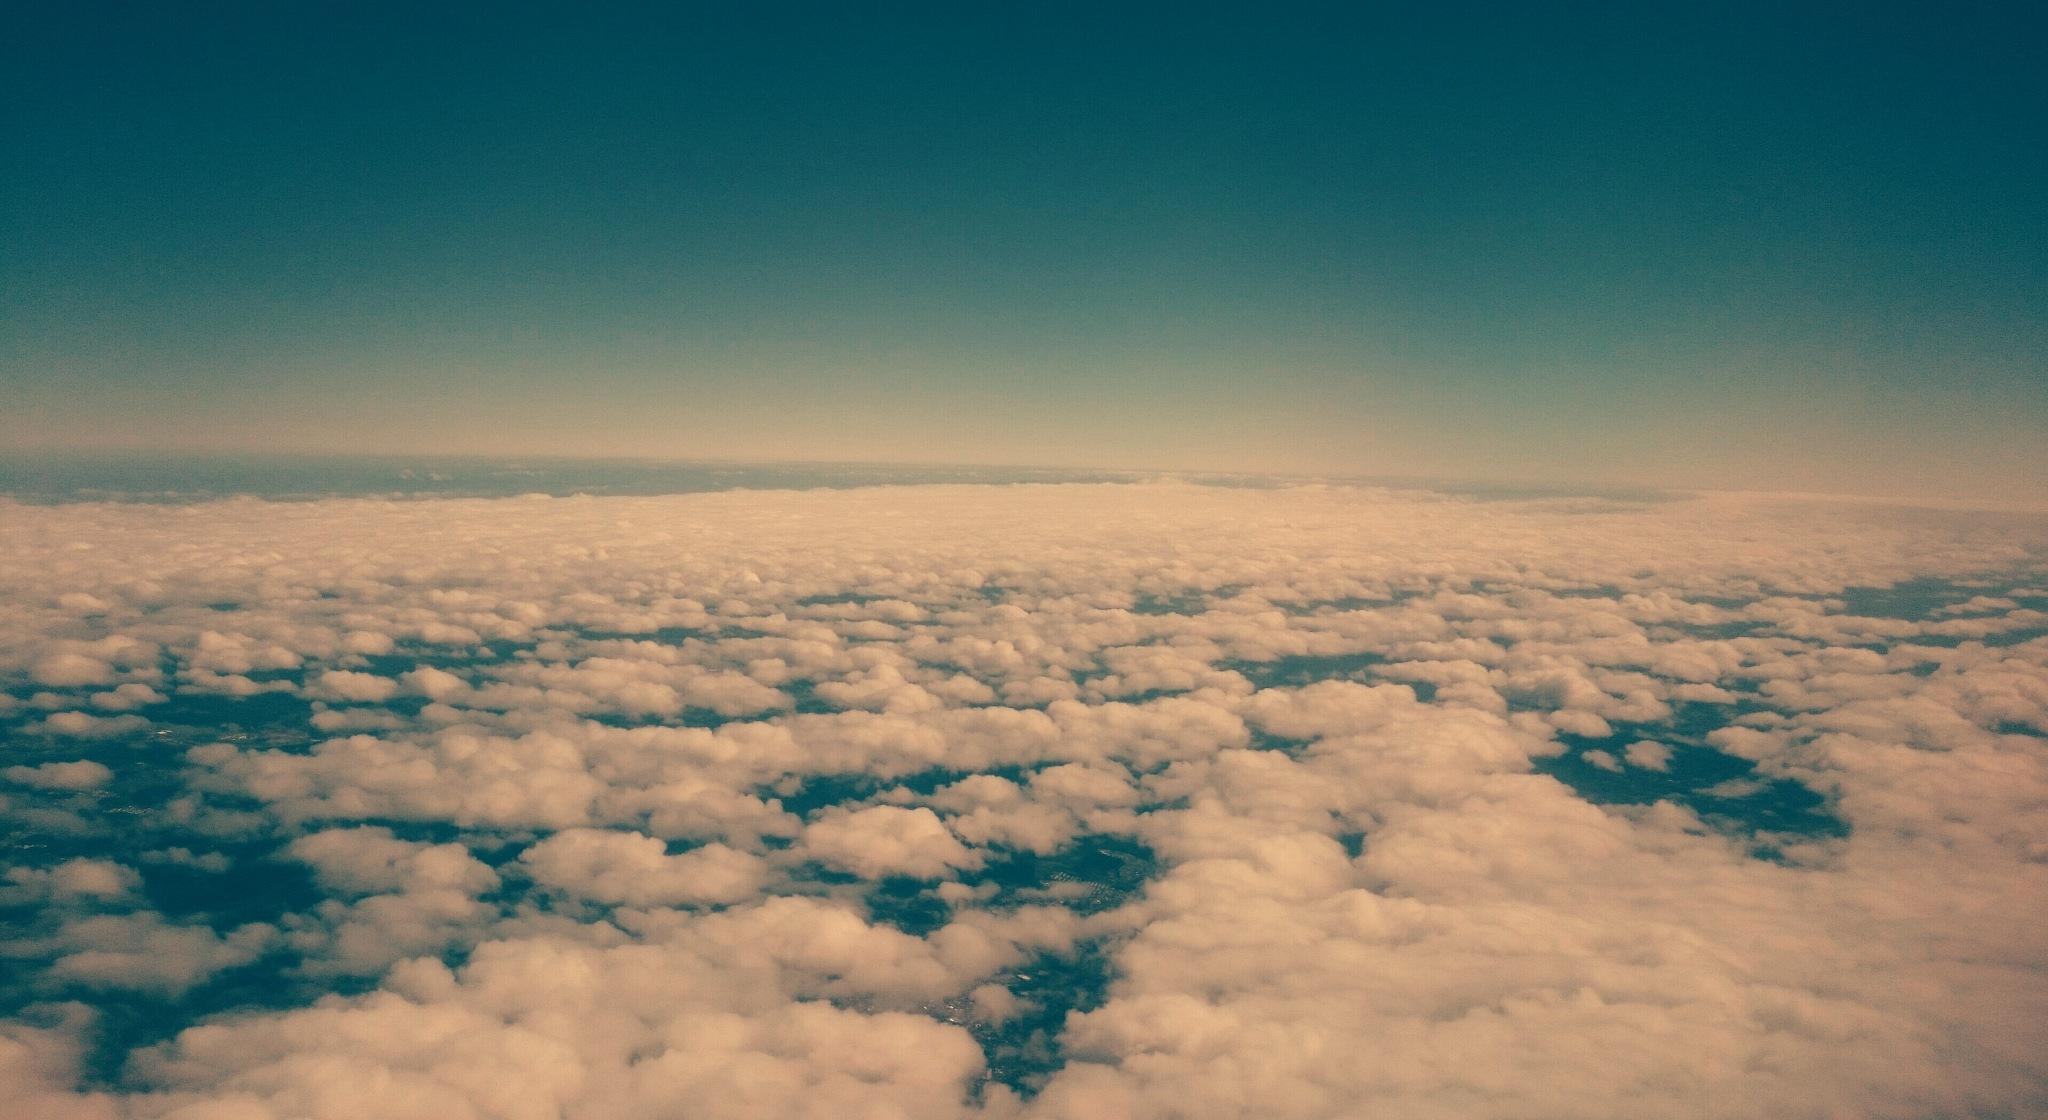 The Sky by Romer Zandomingos Alves